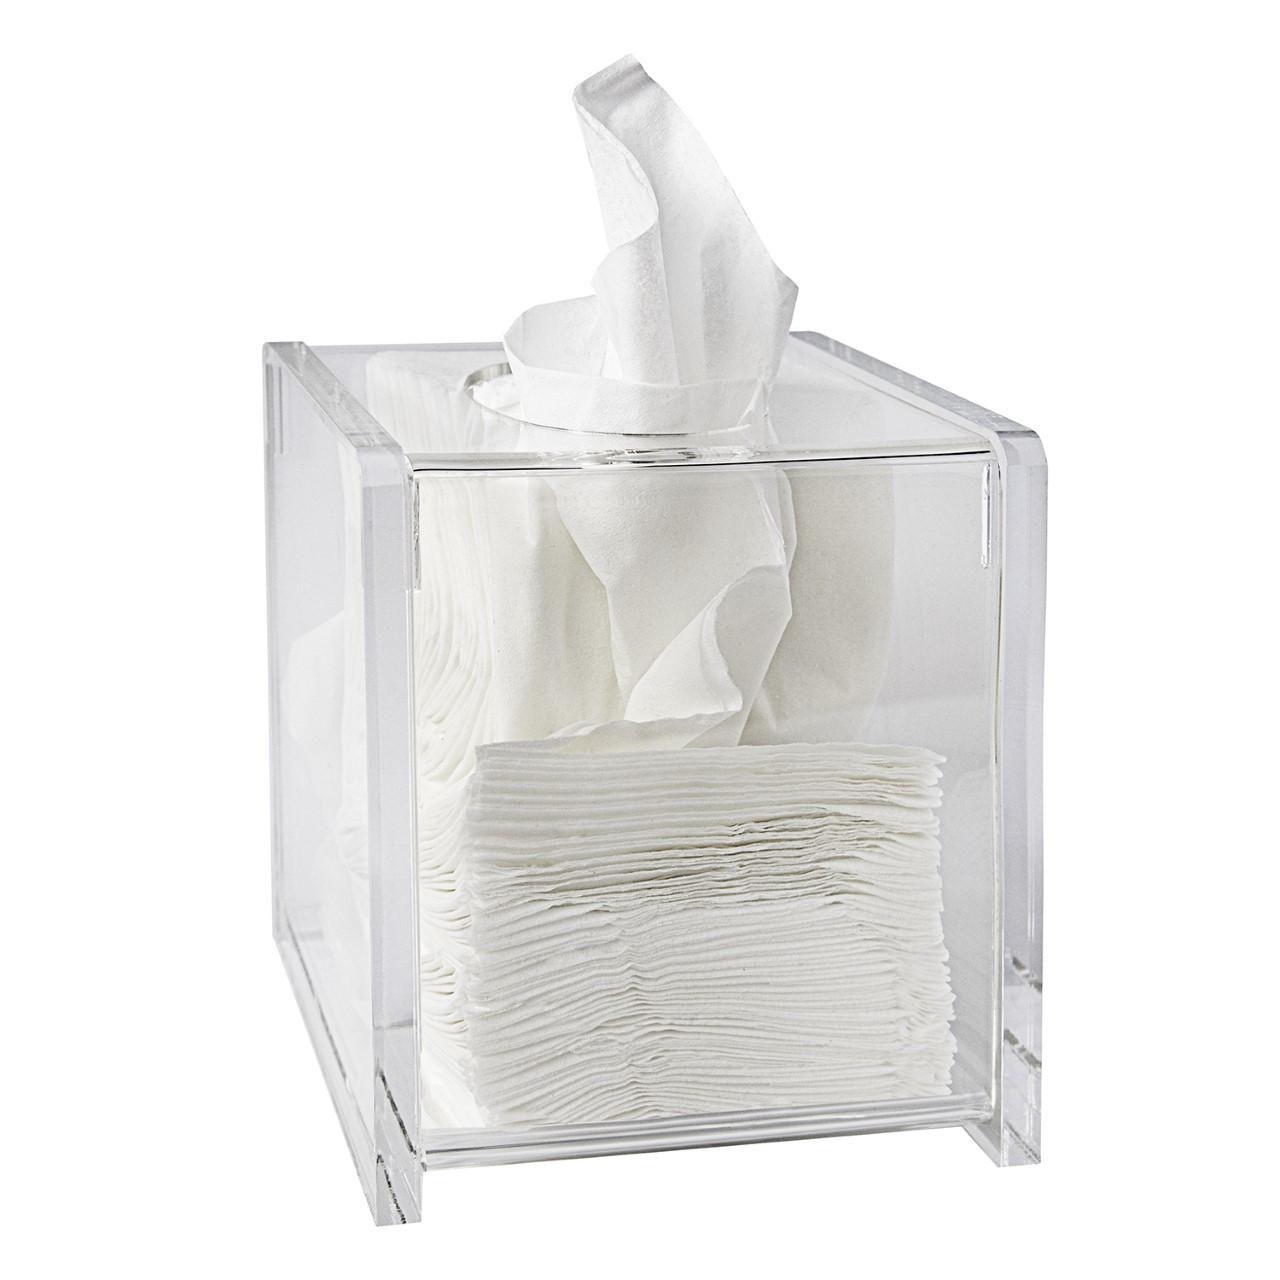 Lucite Tissue Box Covers